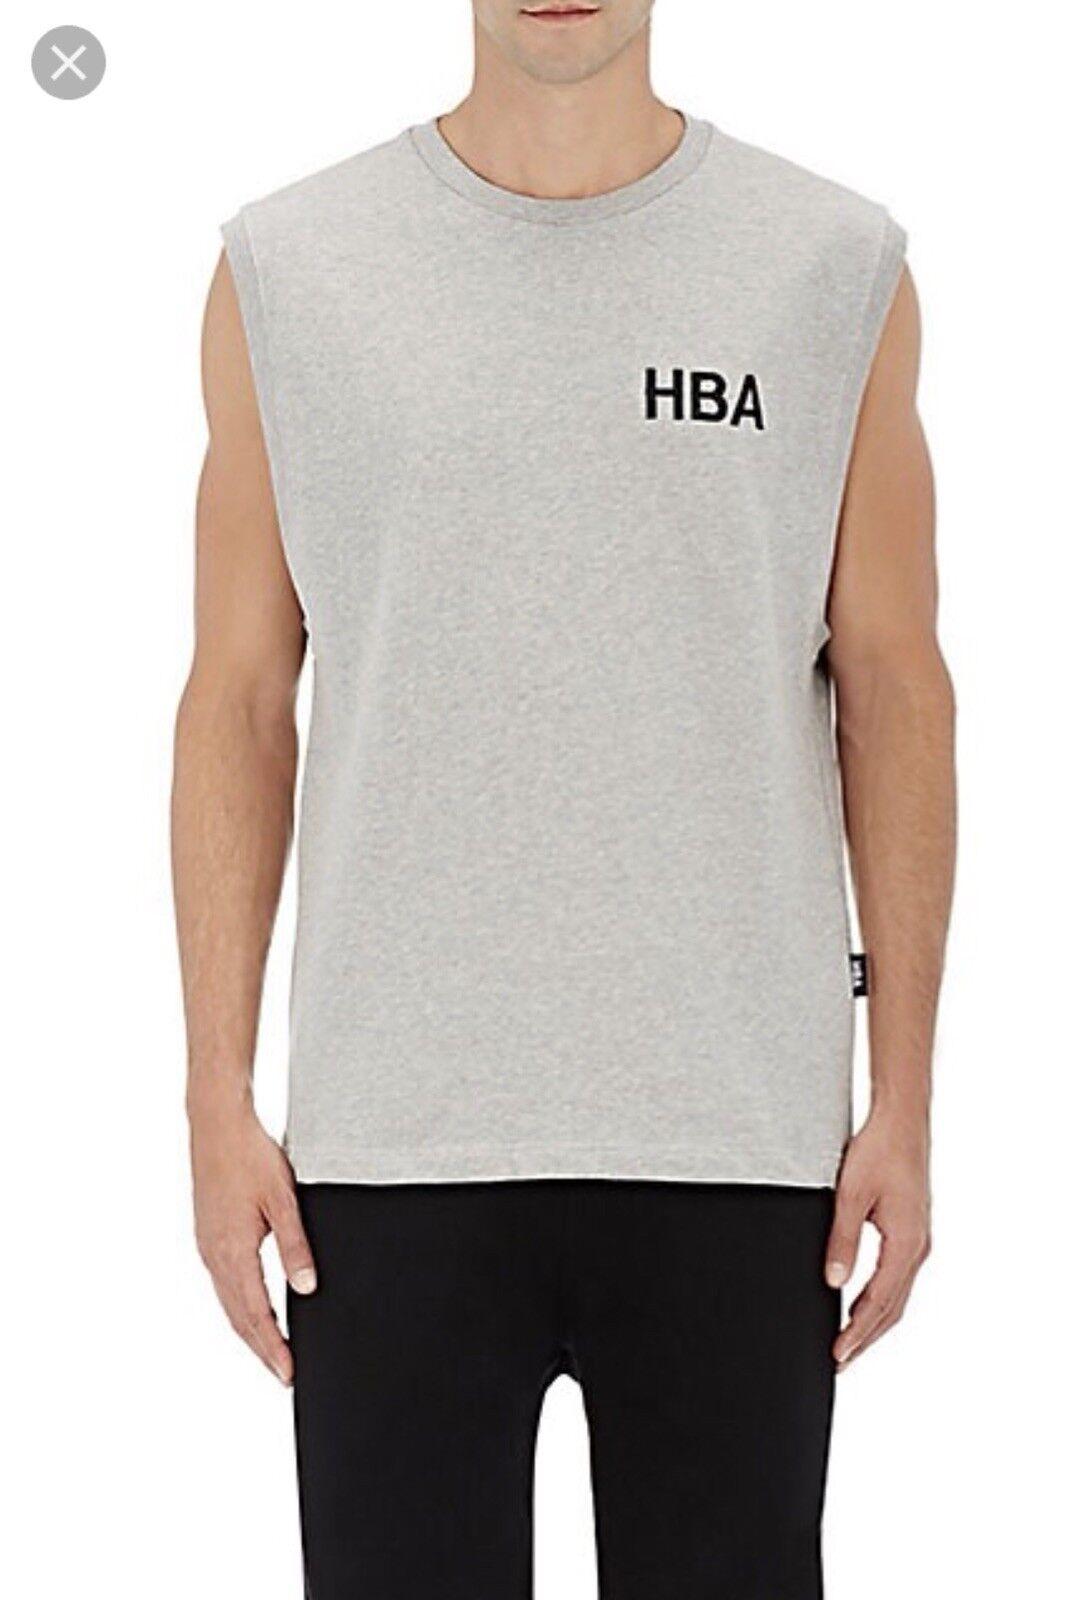 Hood By Air Tank Sleeveless sweat Shirt Crew grigio   grigio size M 4ee7a7